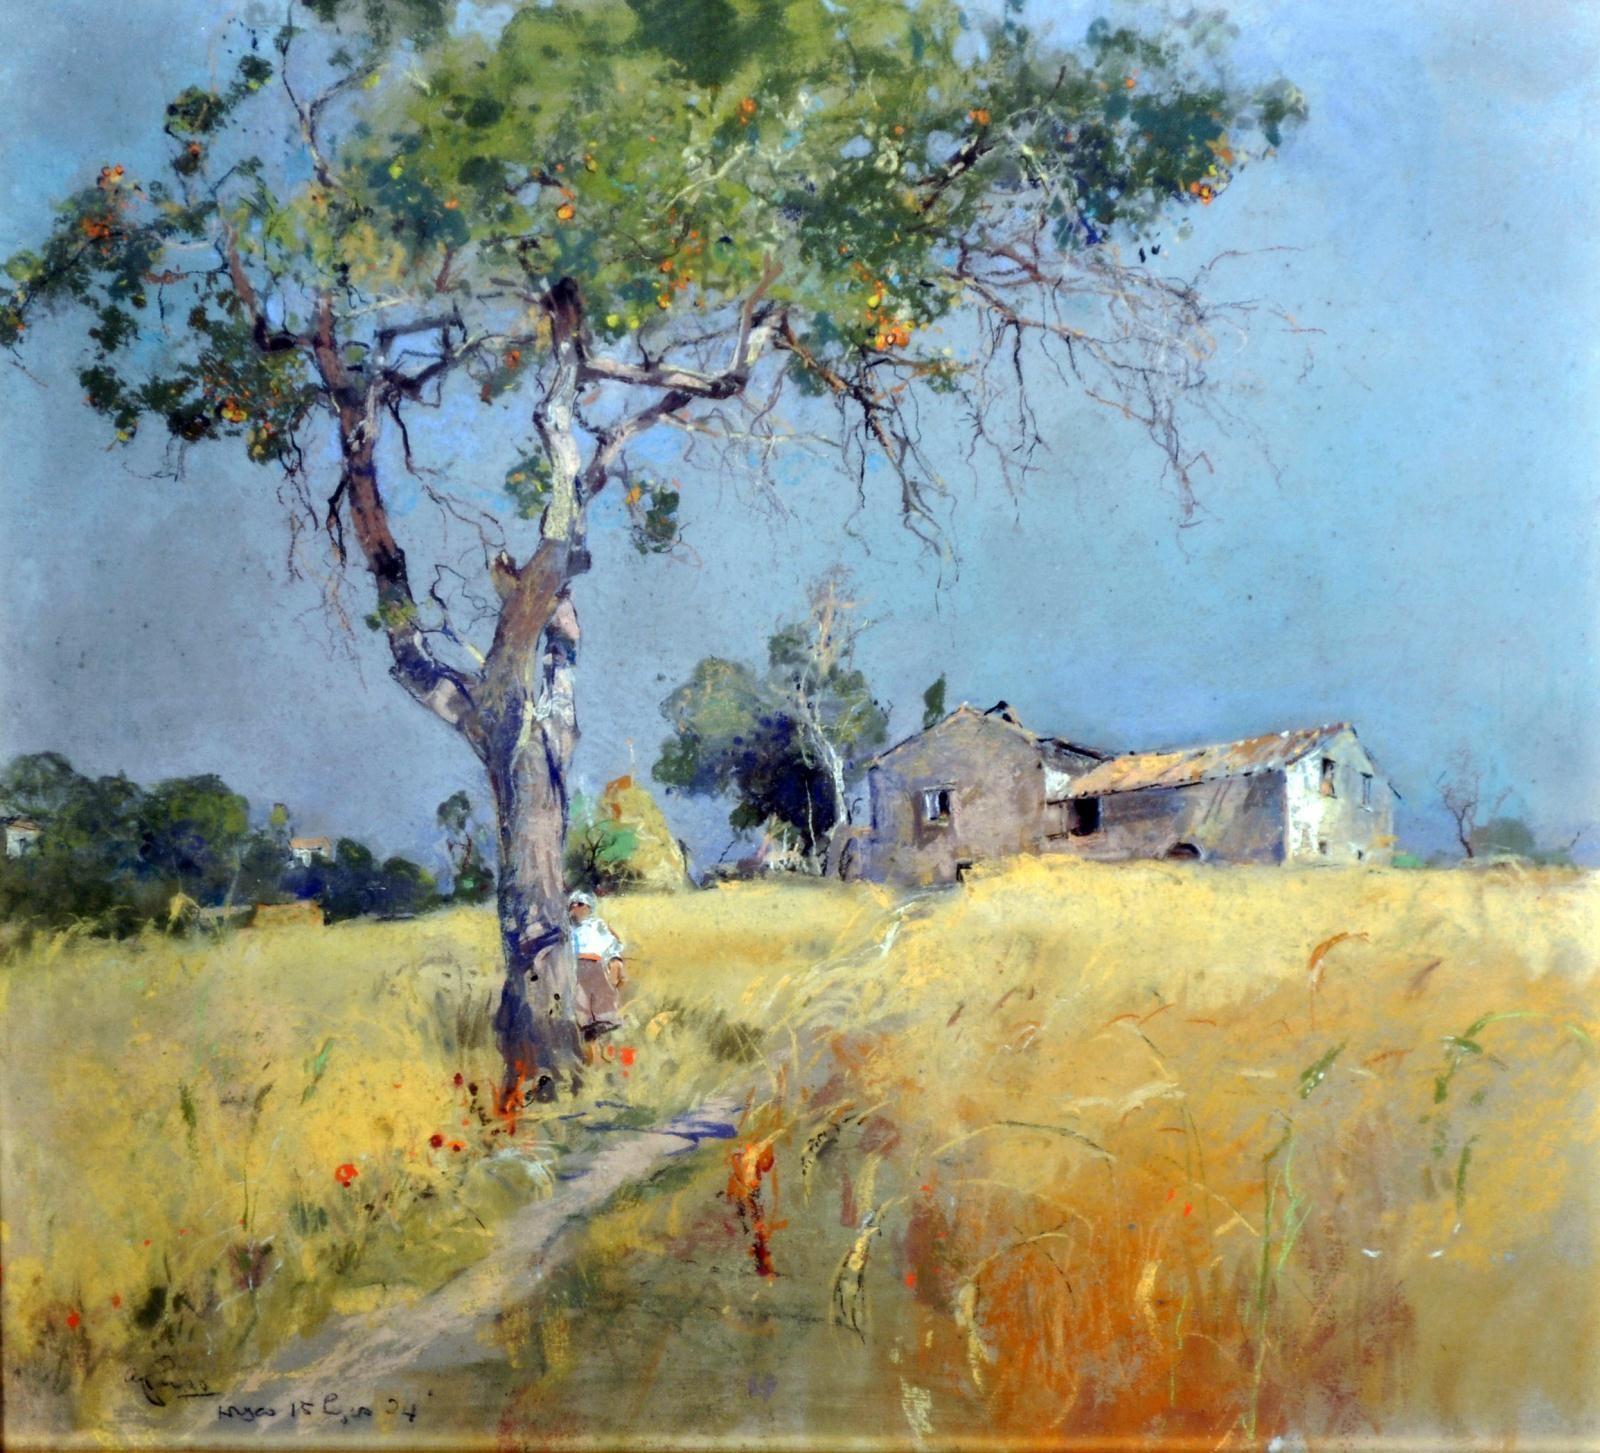 Casciaro Giuseppe Ortelle LE 1863  Napoli 1941 Paesaggio _pastelli su carta  Pastel painting